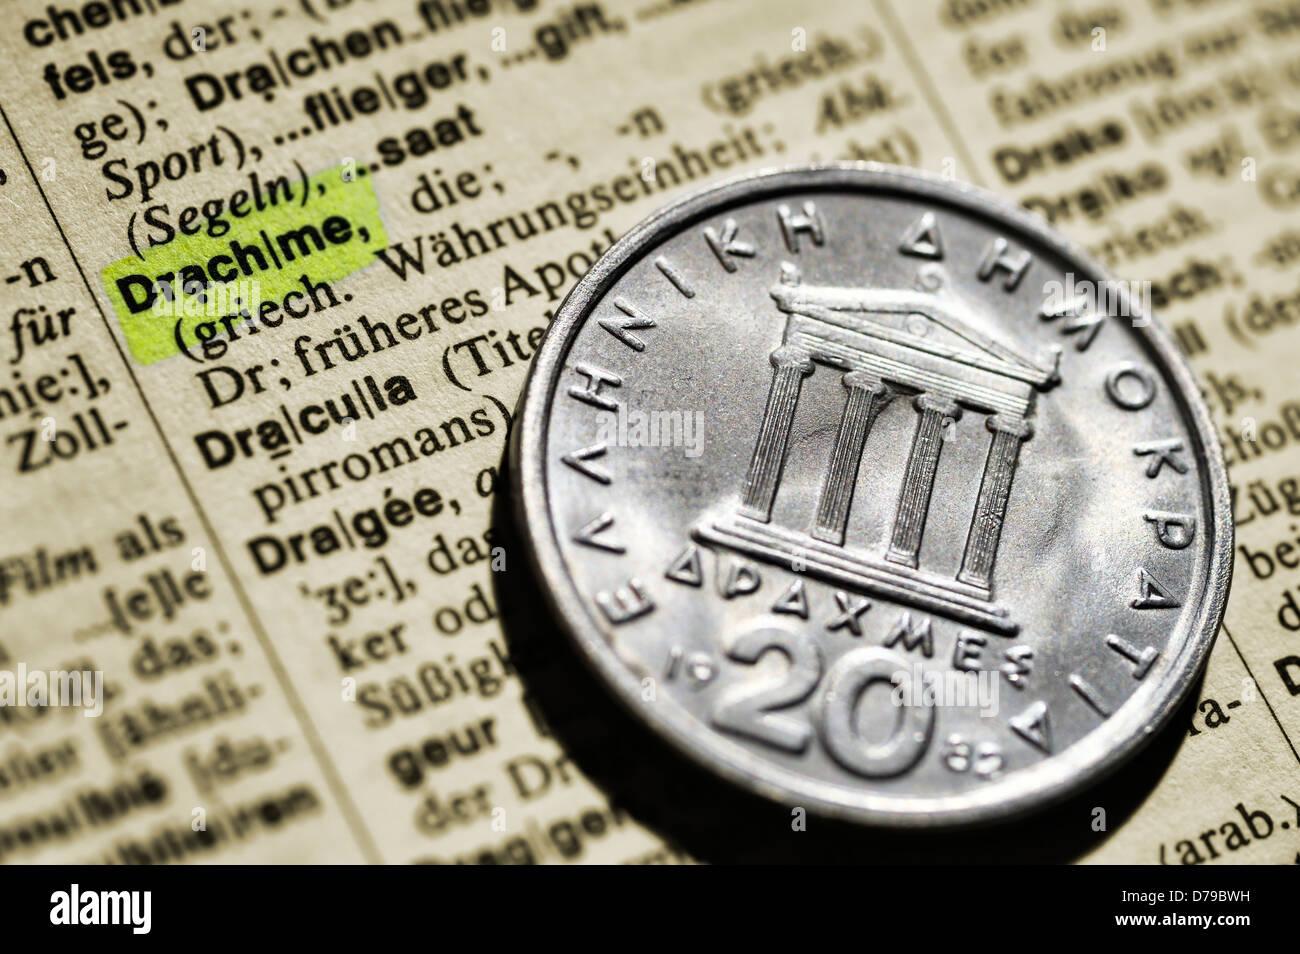 Greek drachm on dictionary , Griechische Drachme auf Wörterbuch - Stock Image